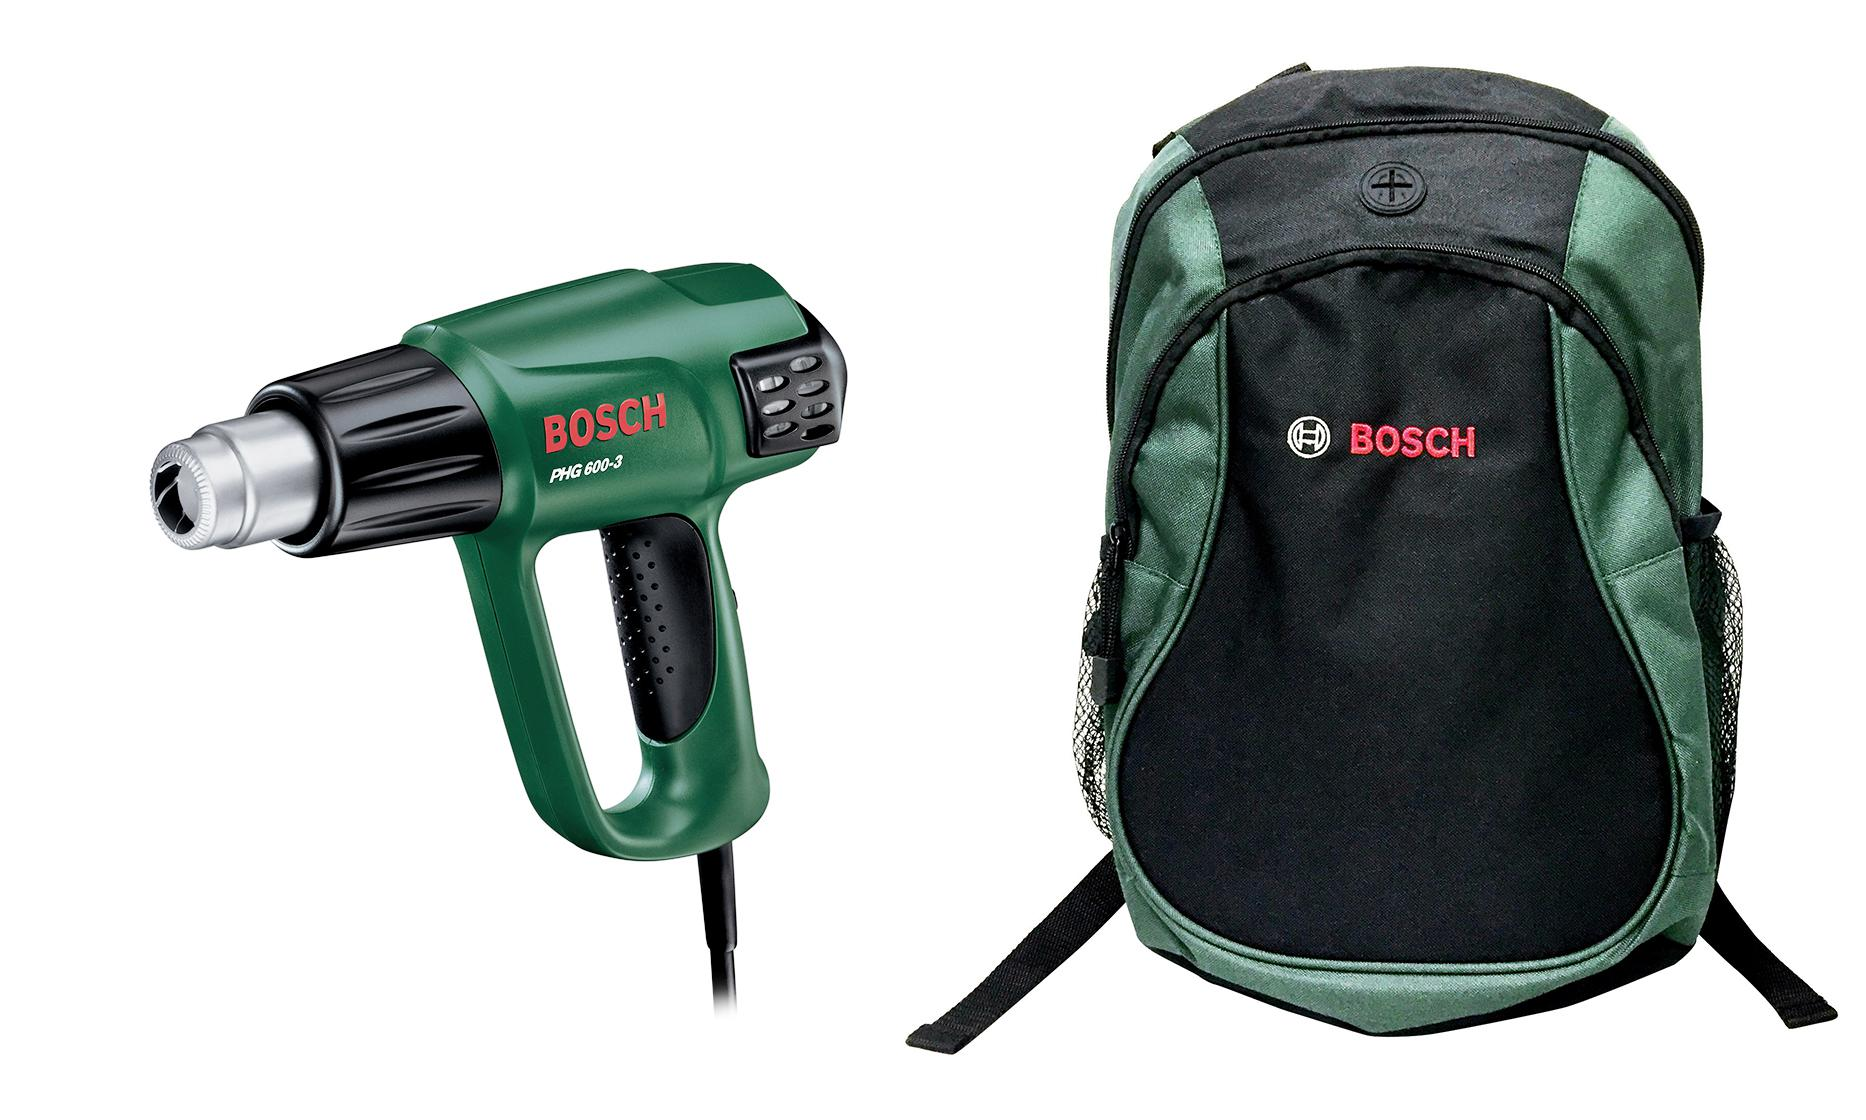 Набор Bosch Фен технический phg 600-3 (0.603.29b.008) +Рюкзак green (1619g45200) bosch phg 600 3 060329 b 008